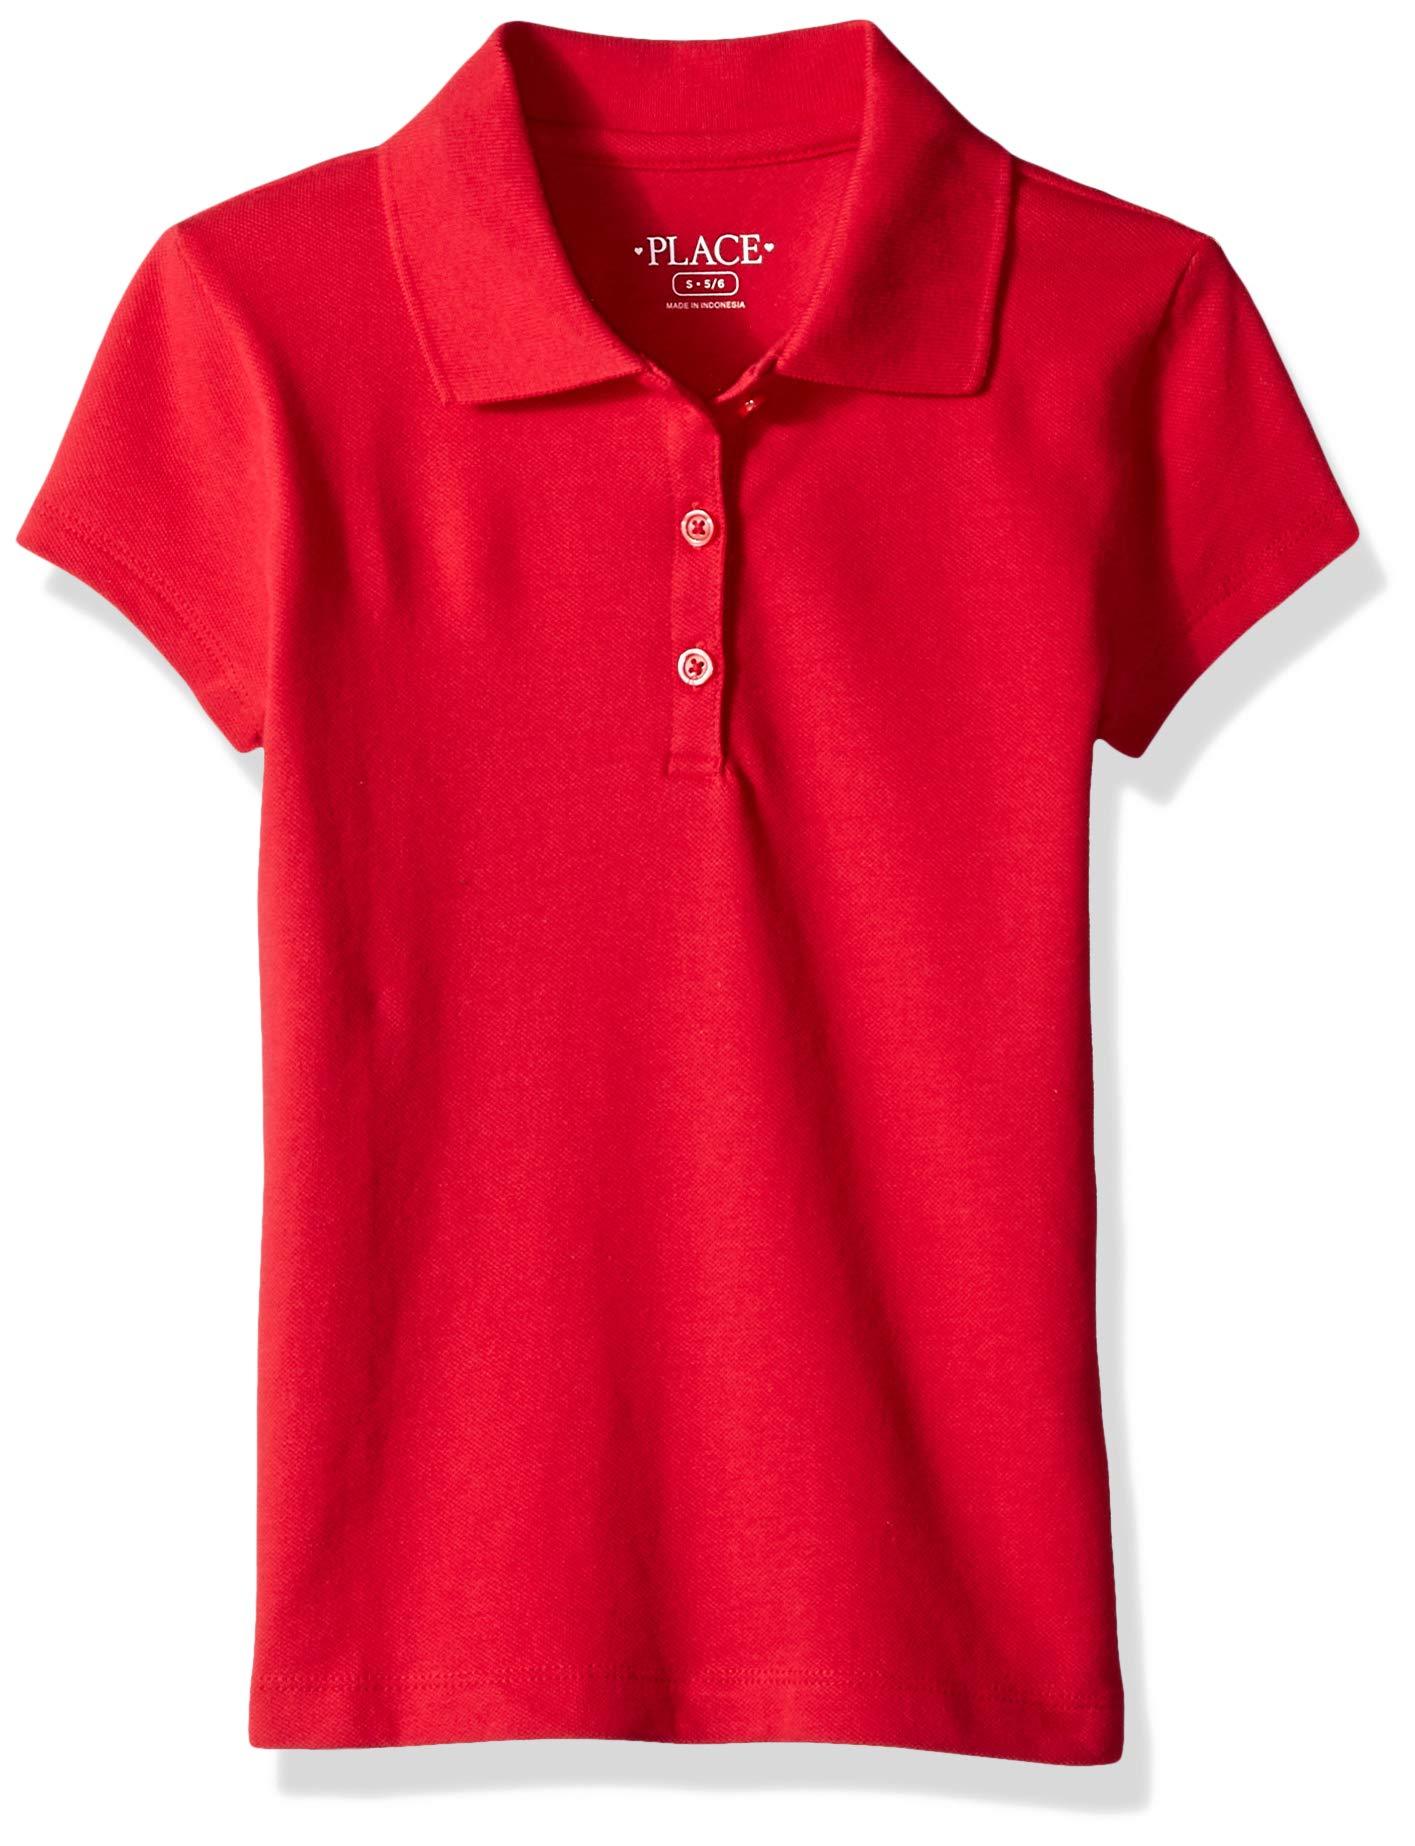 The Children's Place Big Girls' Uniform Short Sleeve Polo, Ruby 3378, M (7/8)